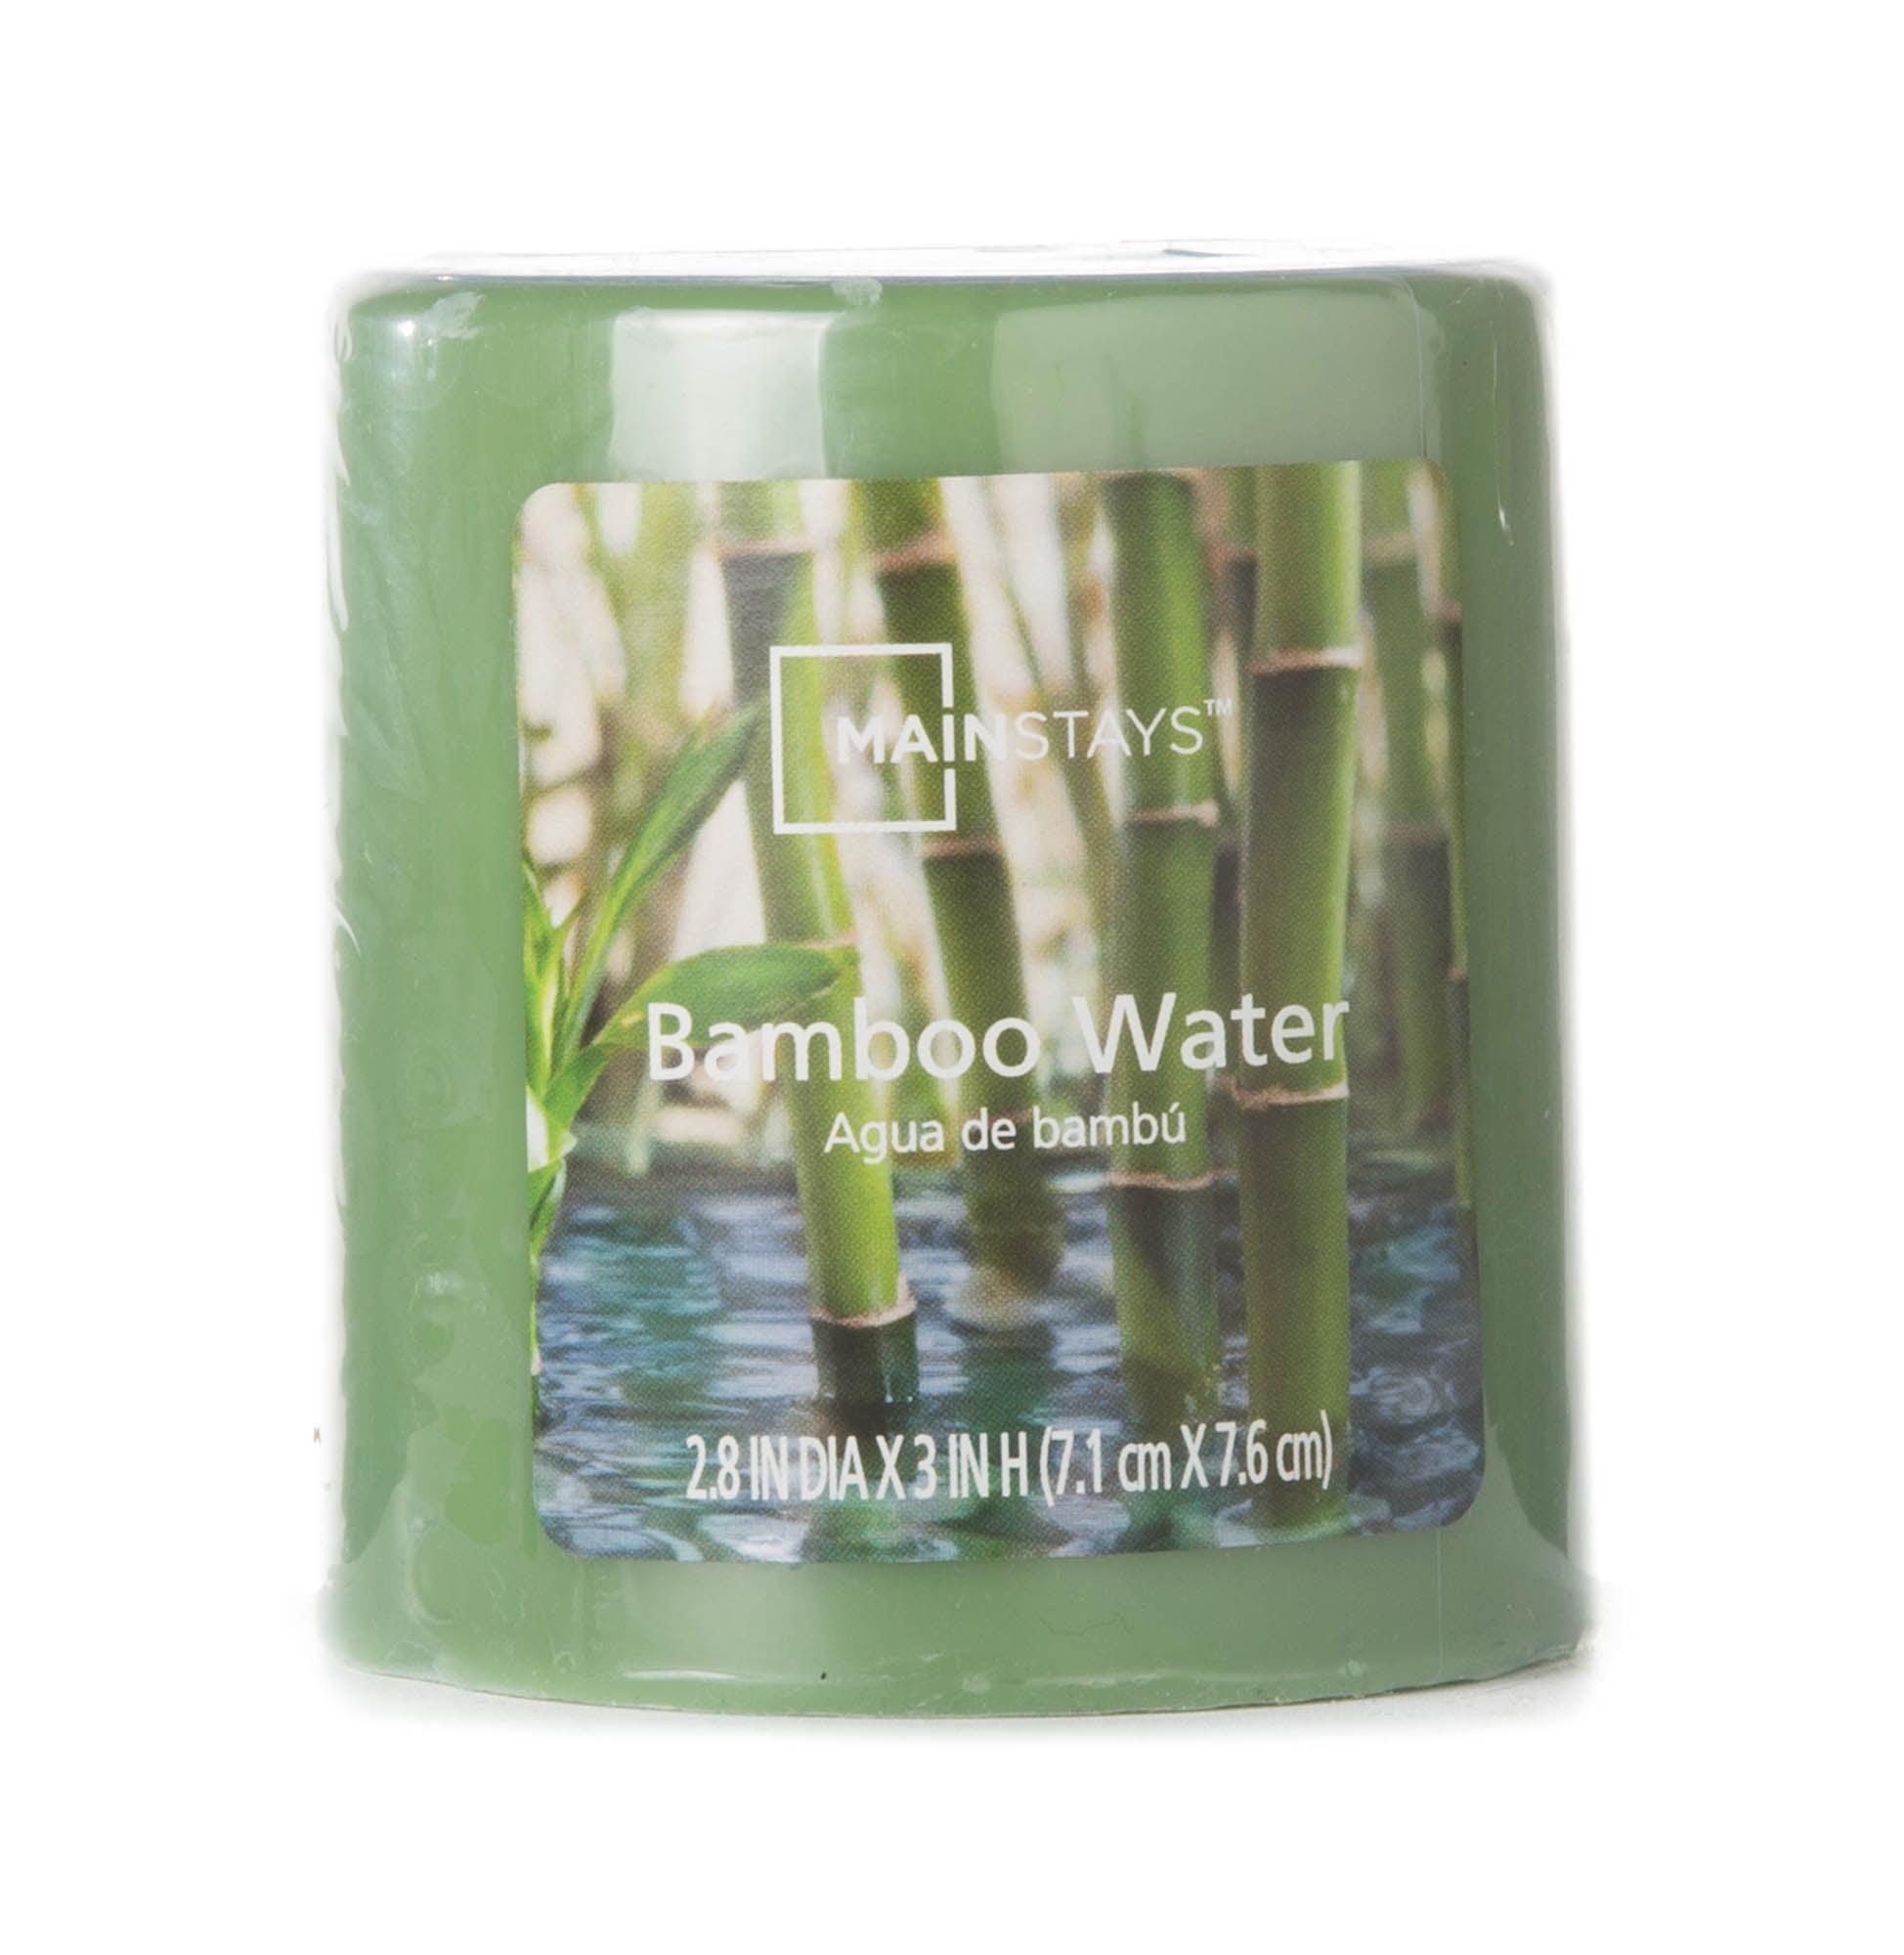 "Mainstays 3"" Pillar Bamboo Water Candle"